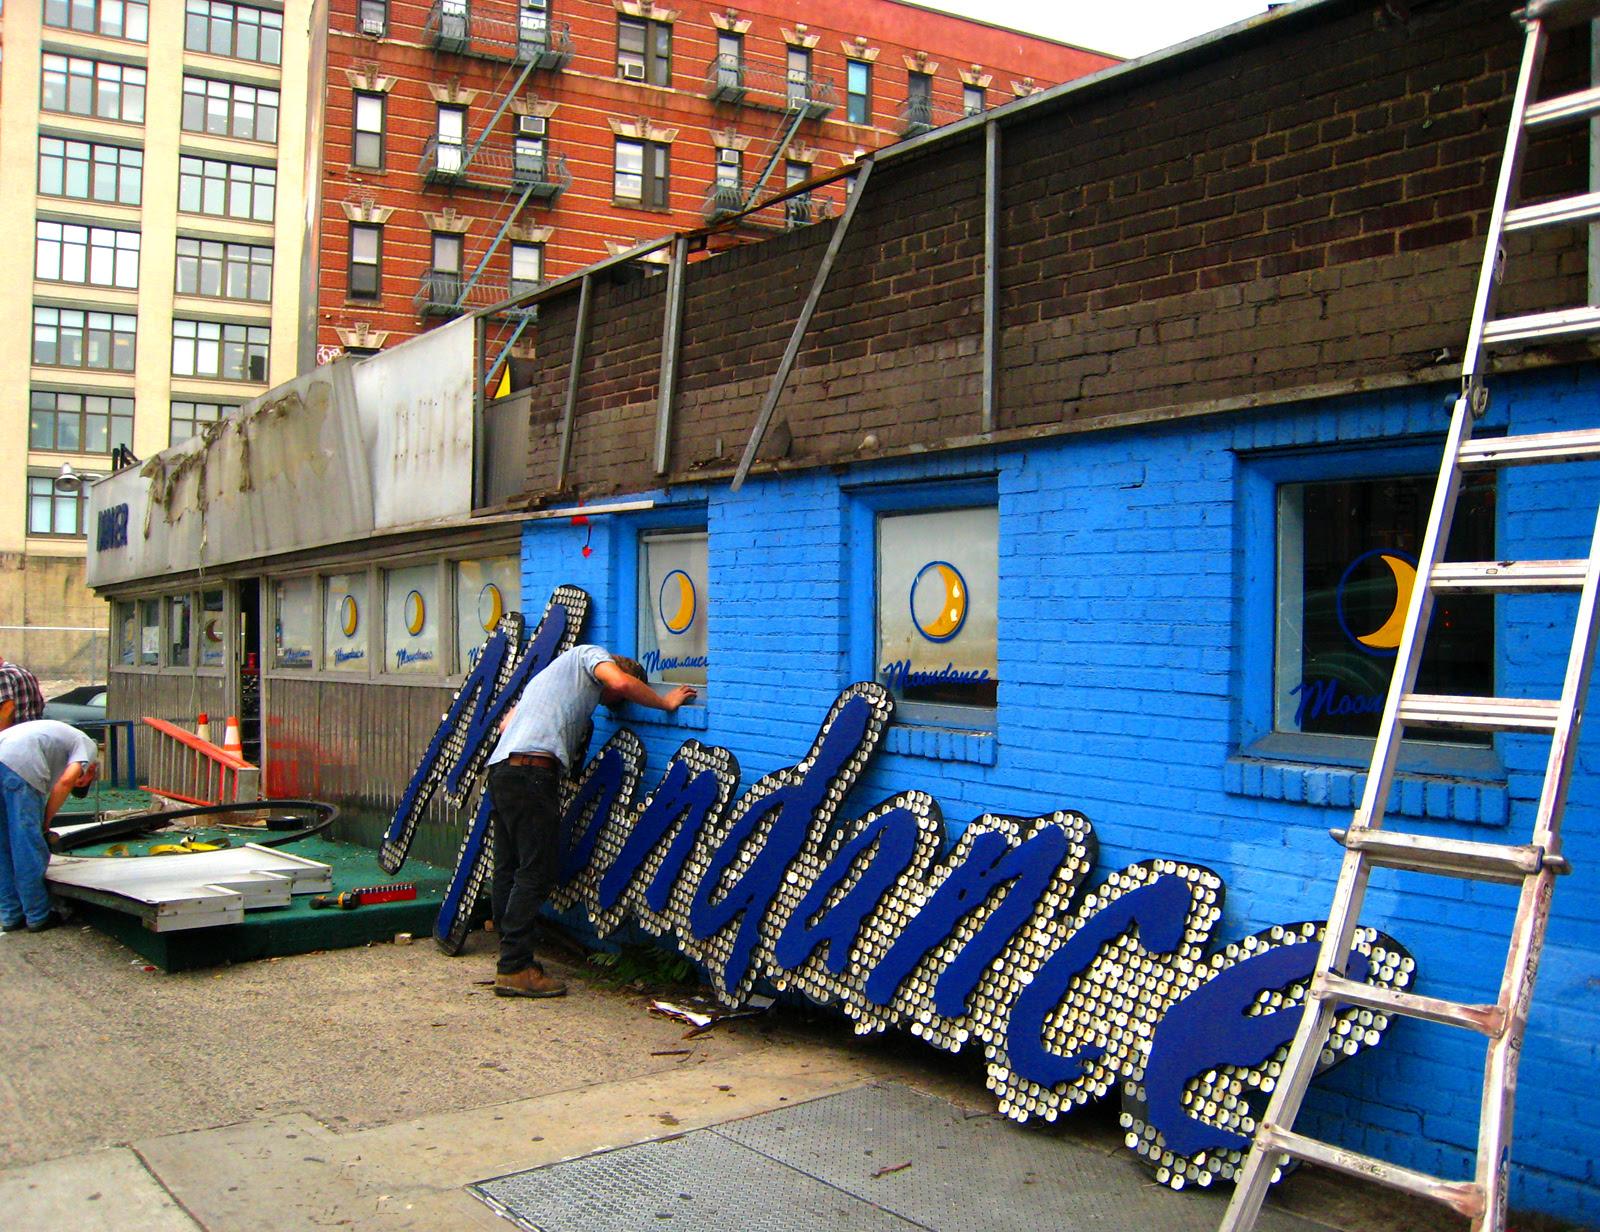 Dismantling the Moondance